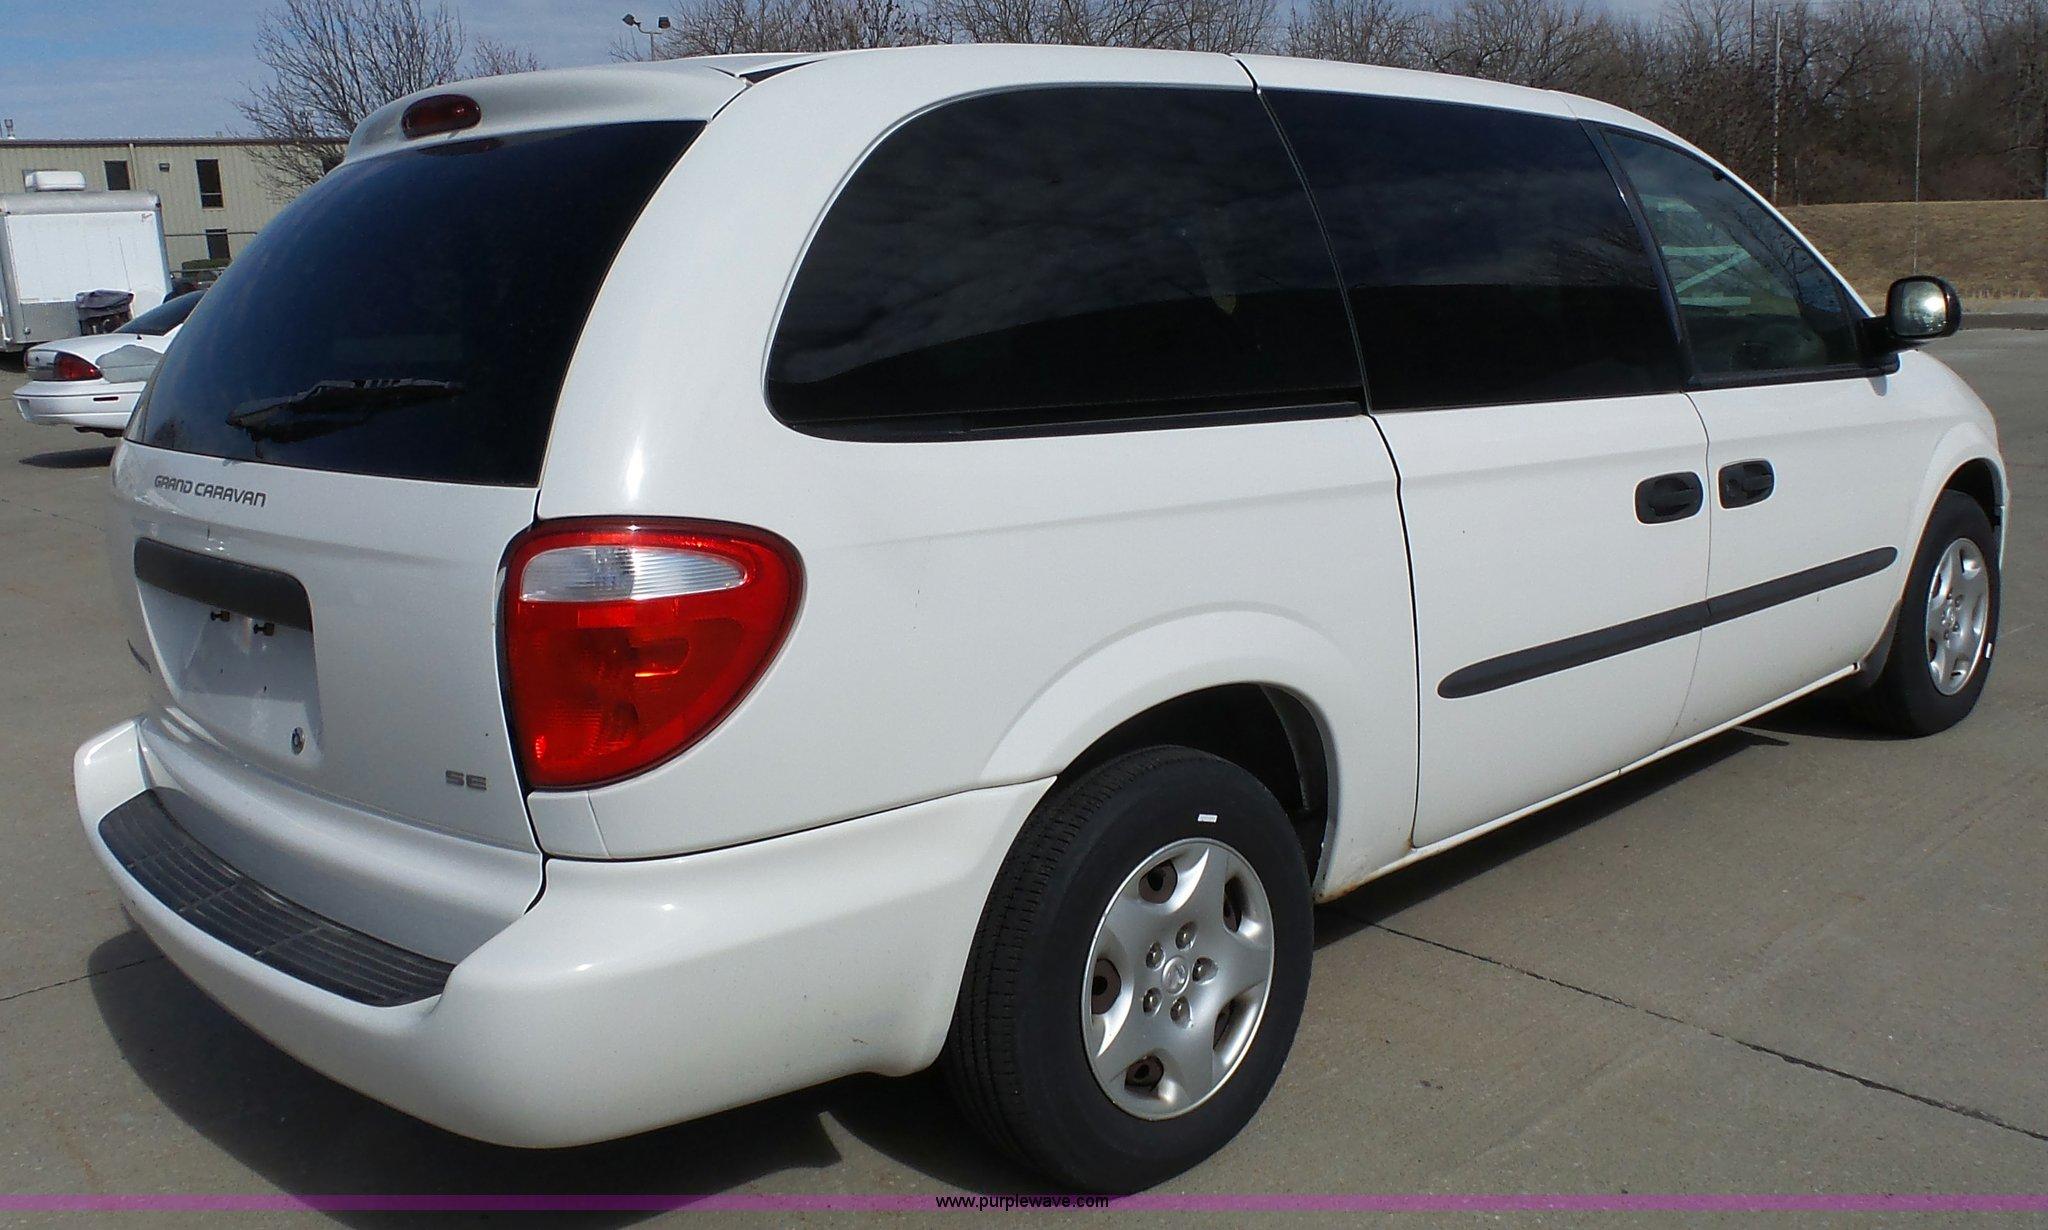 2003 Dodge Grand Caravan Se Van Item L4790 Sold April 5 Full Size In New Window